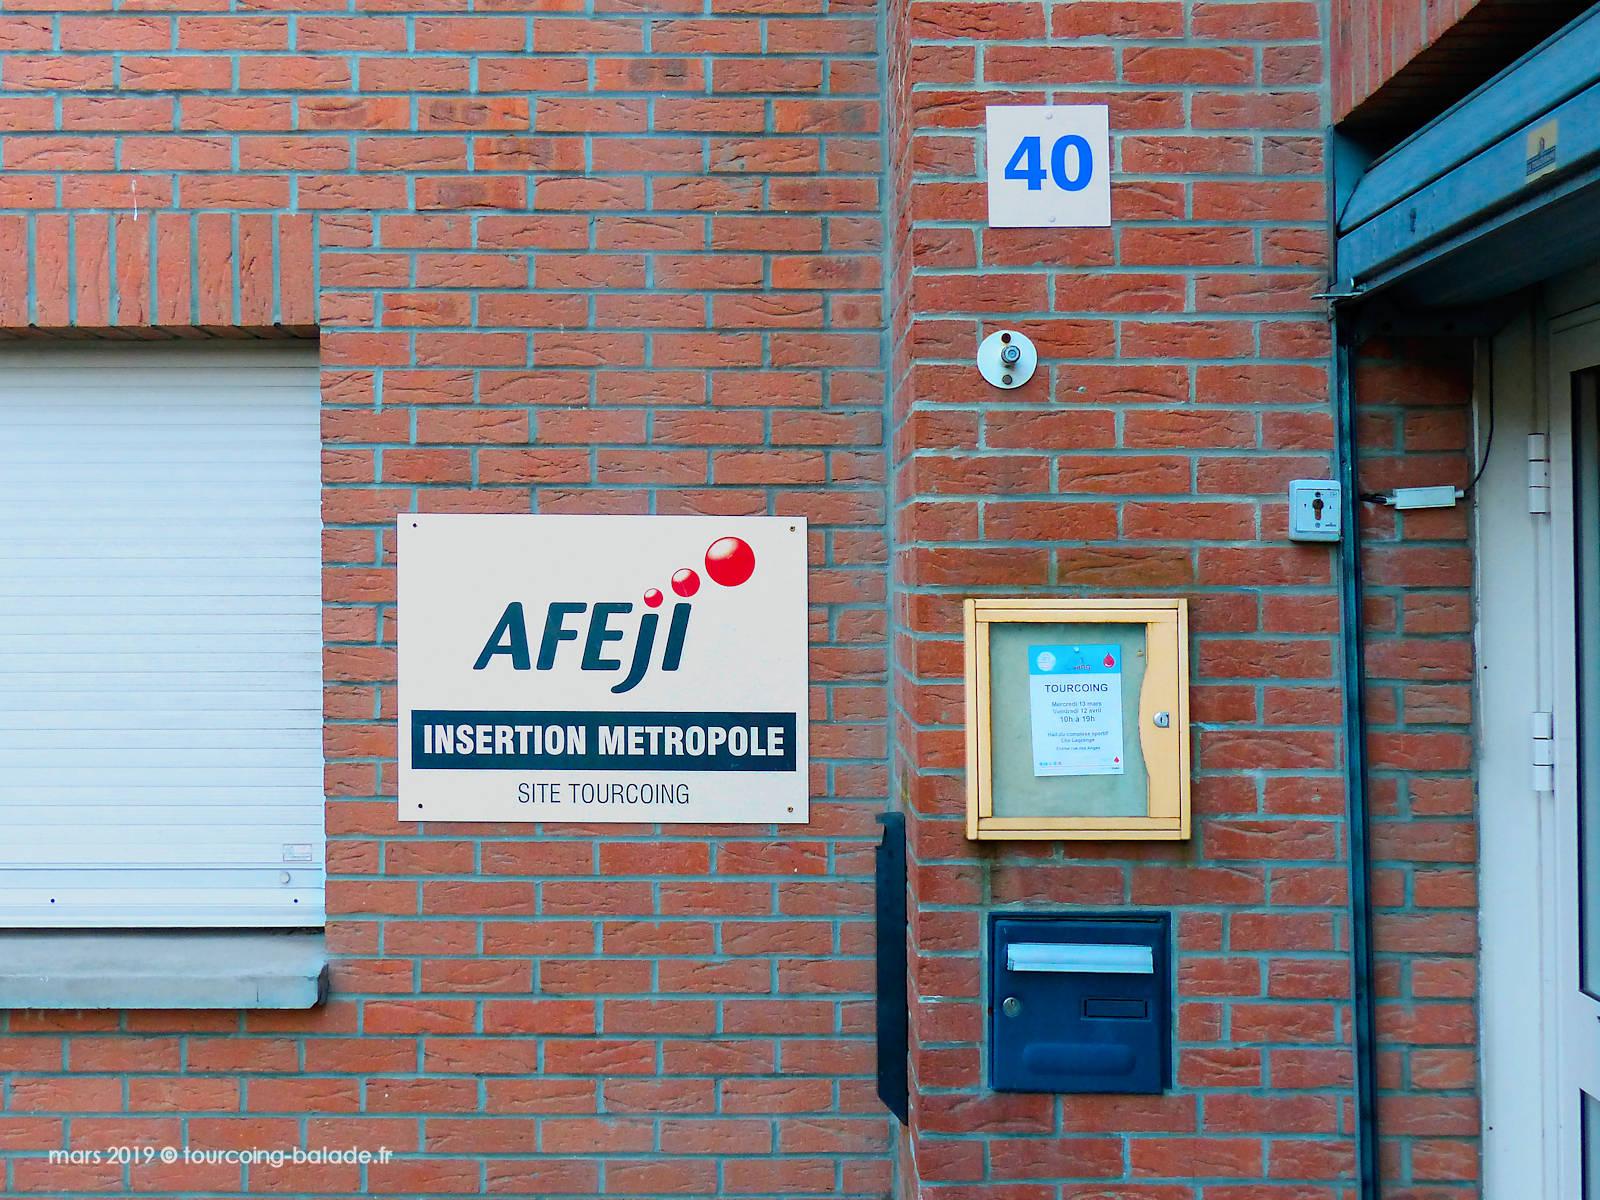 AFEJI Insertion Métropole, Site Tourcoing